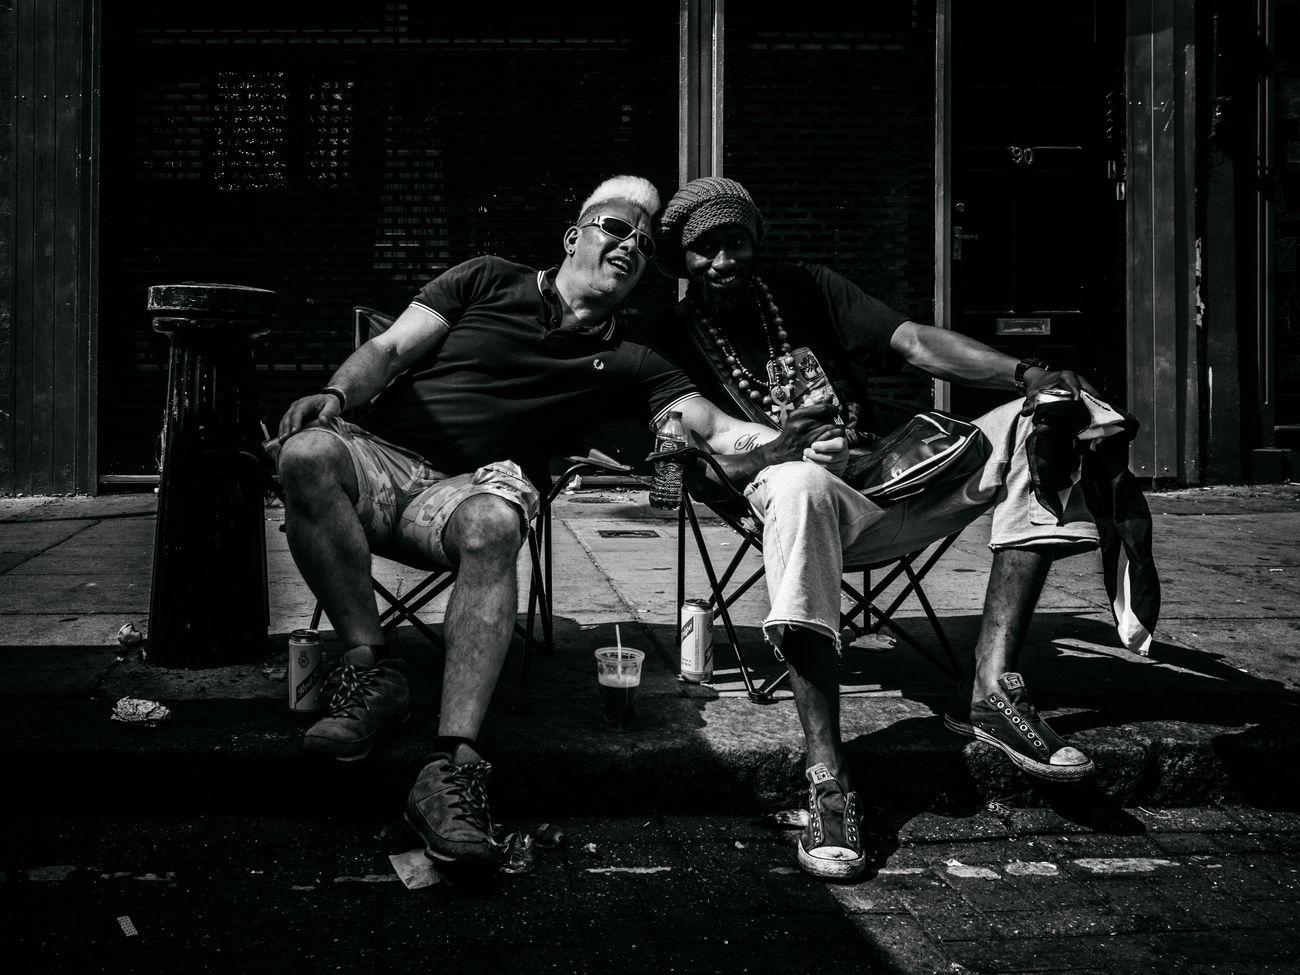 Friends will be friends. Monochrome Photography Street Photography Street Streetphotography Maxgor Maxgor.com Rawstreets Blackandwhite Streetphotography_bw Black And White Streetphoto_bw Olympuspenef Olympus Pen-f Peope London Prime Lens 35mm Notting Hill